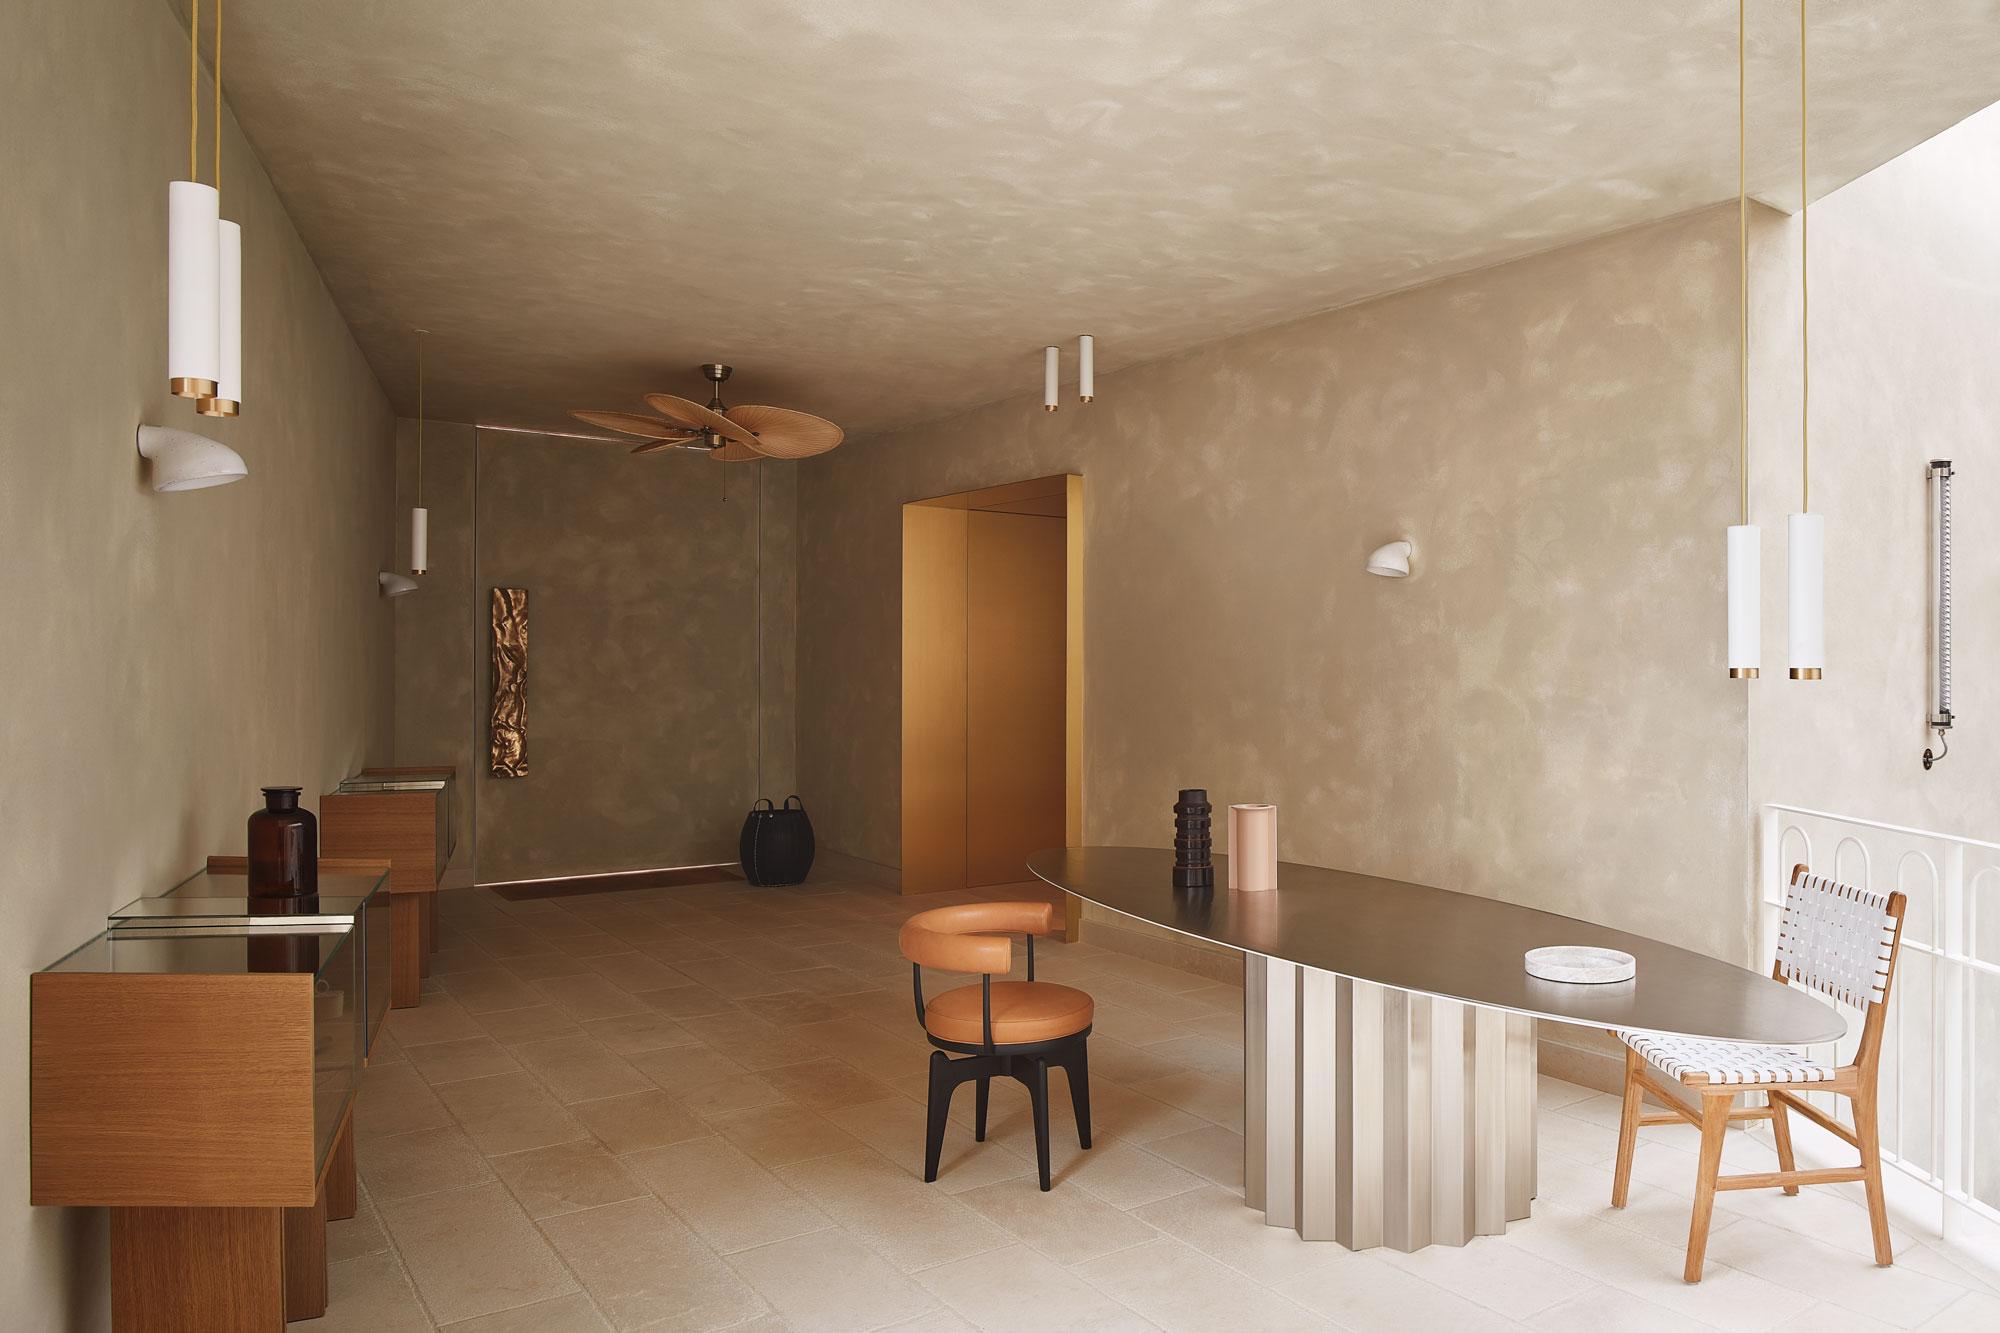 Lam Studio Hotel Maslina Hvar Croatia Luxury Accommodatino Photo Claire Israel Yellowtrace 06